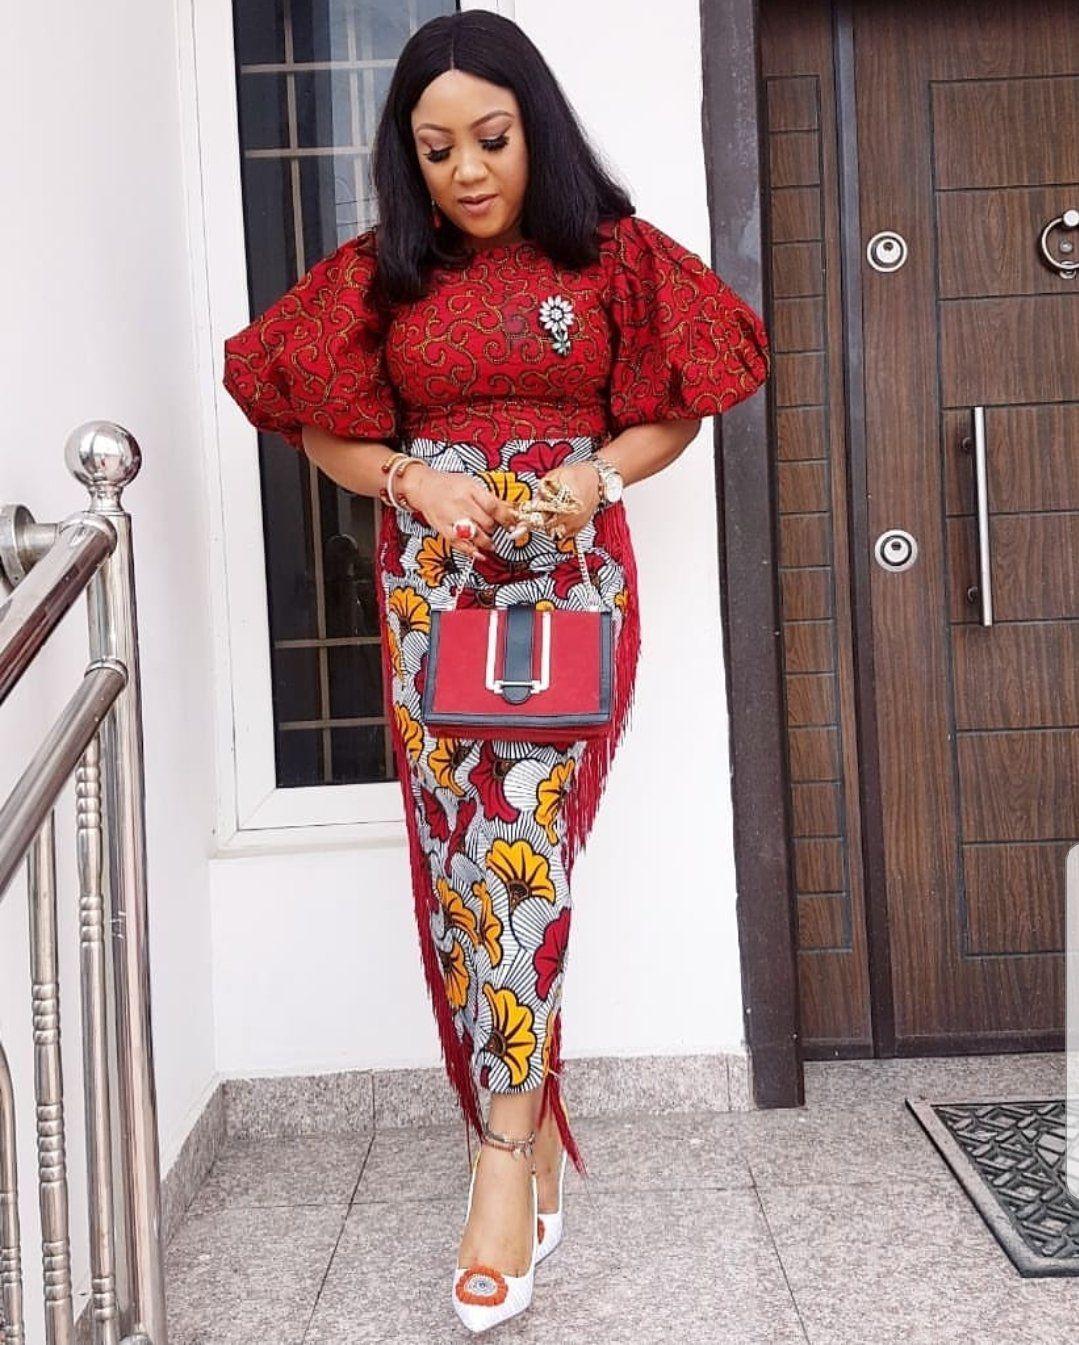 100 Must Have Gorgeous Ankara Styles Wedding Digest Naija Blog African Fashion Modern African Dresses For Women African Print Fashion Dresses